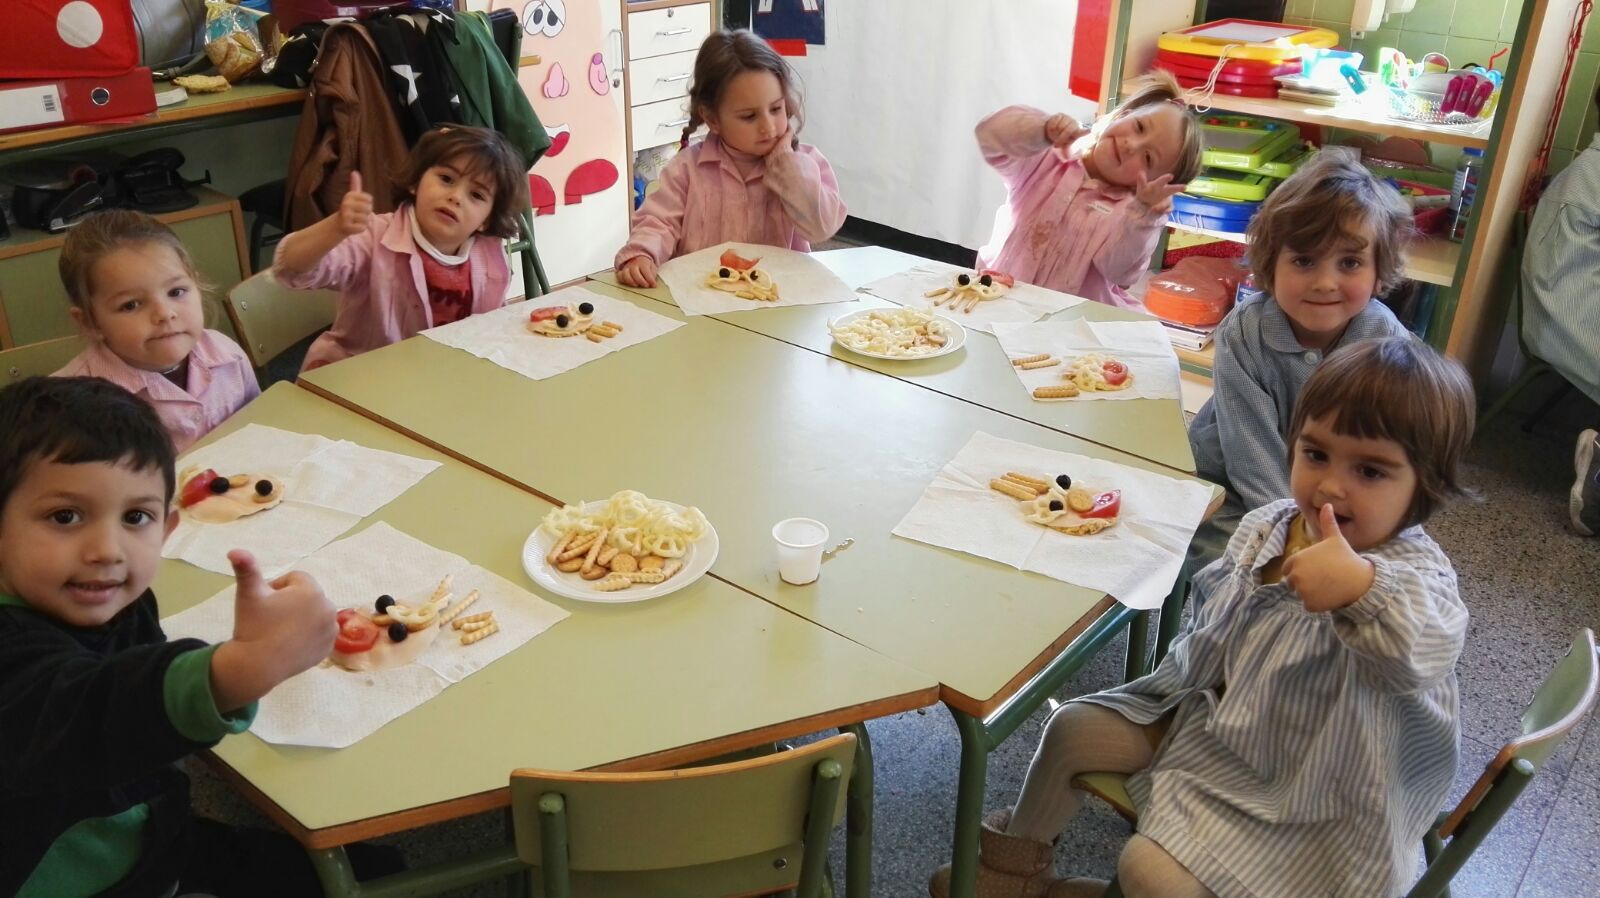 La voz del reyes taller de cocina infantil 3 a os - Talleres de cocina infantil ...